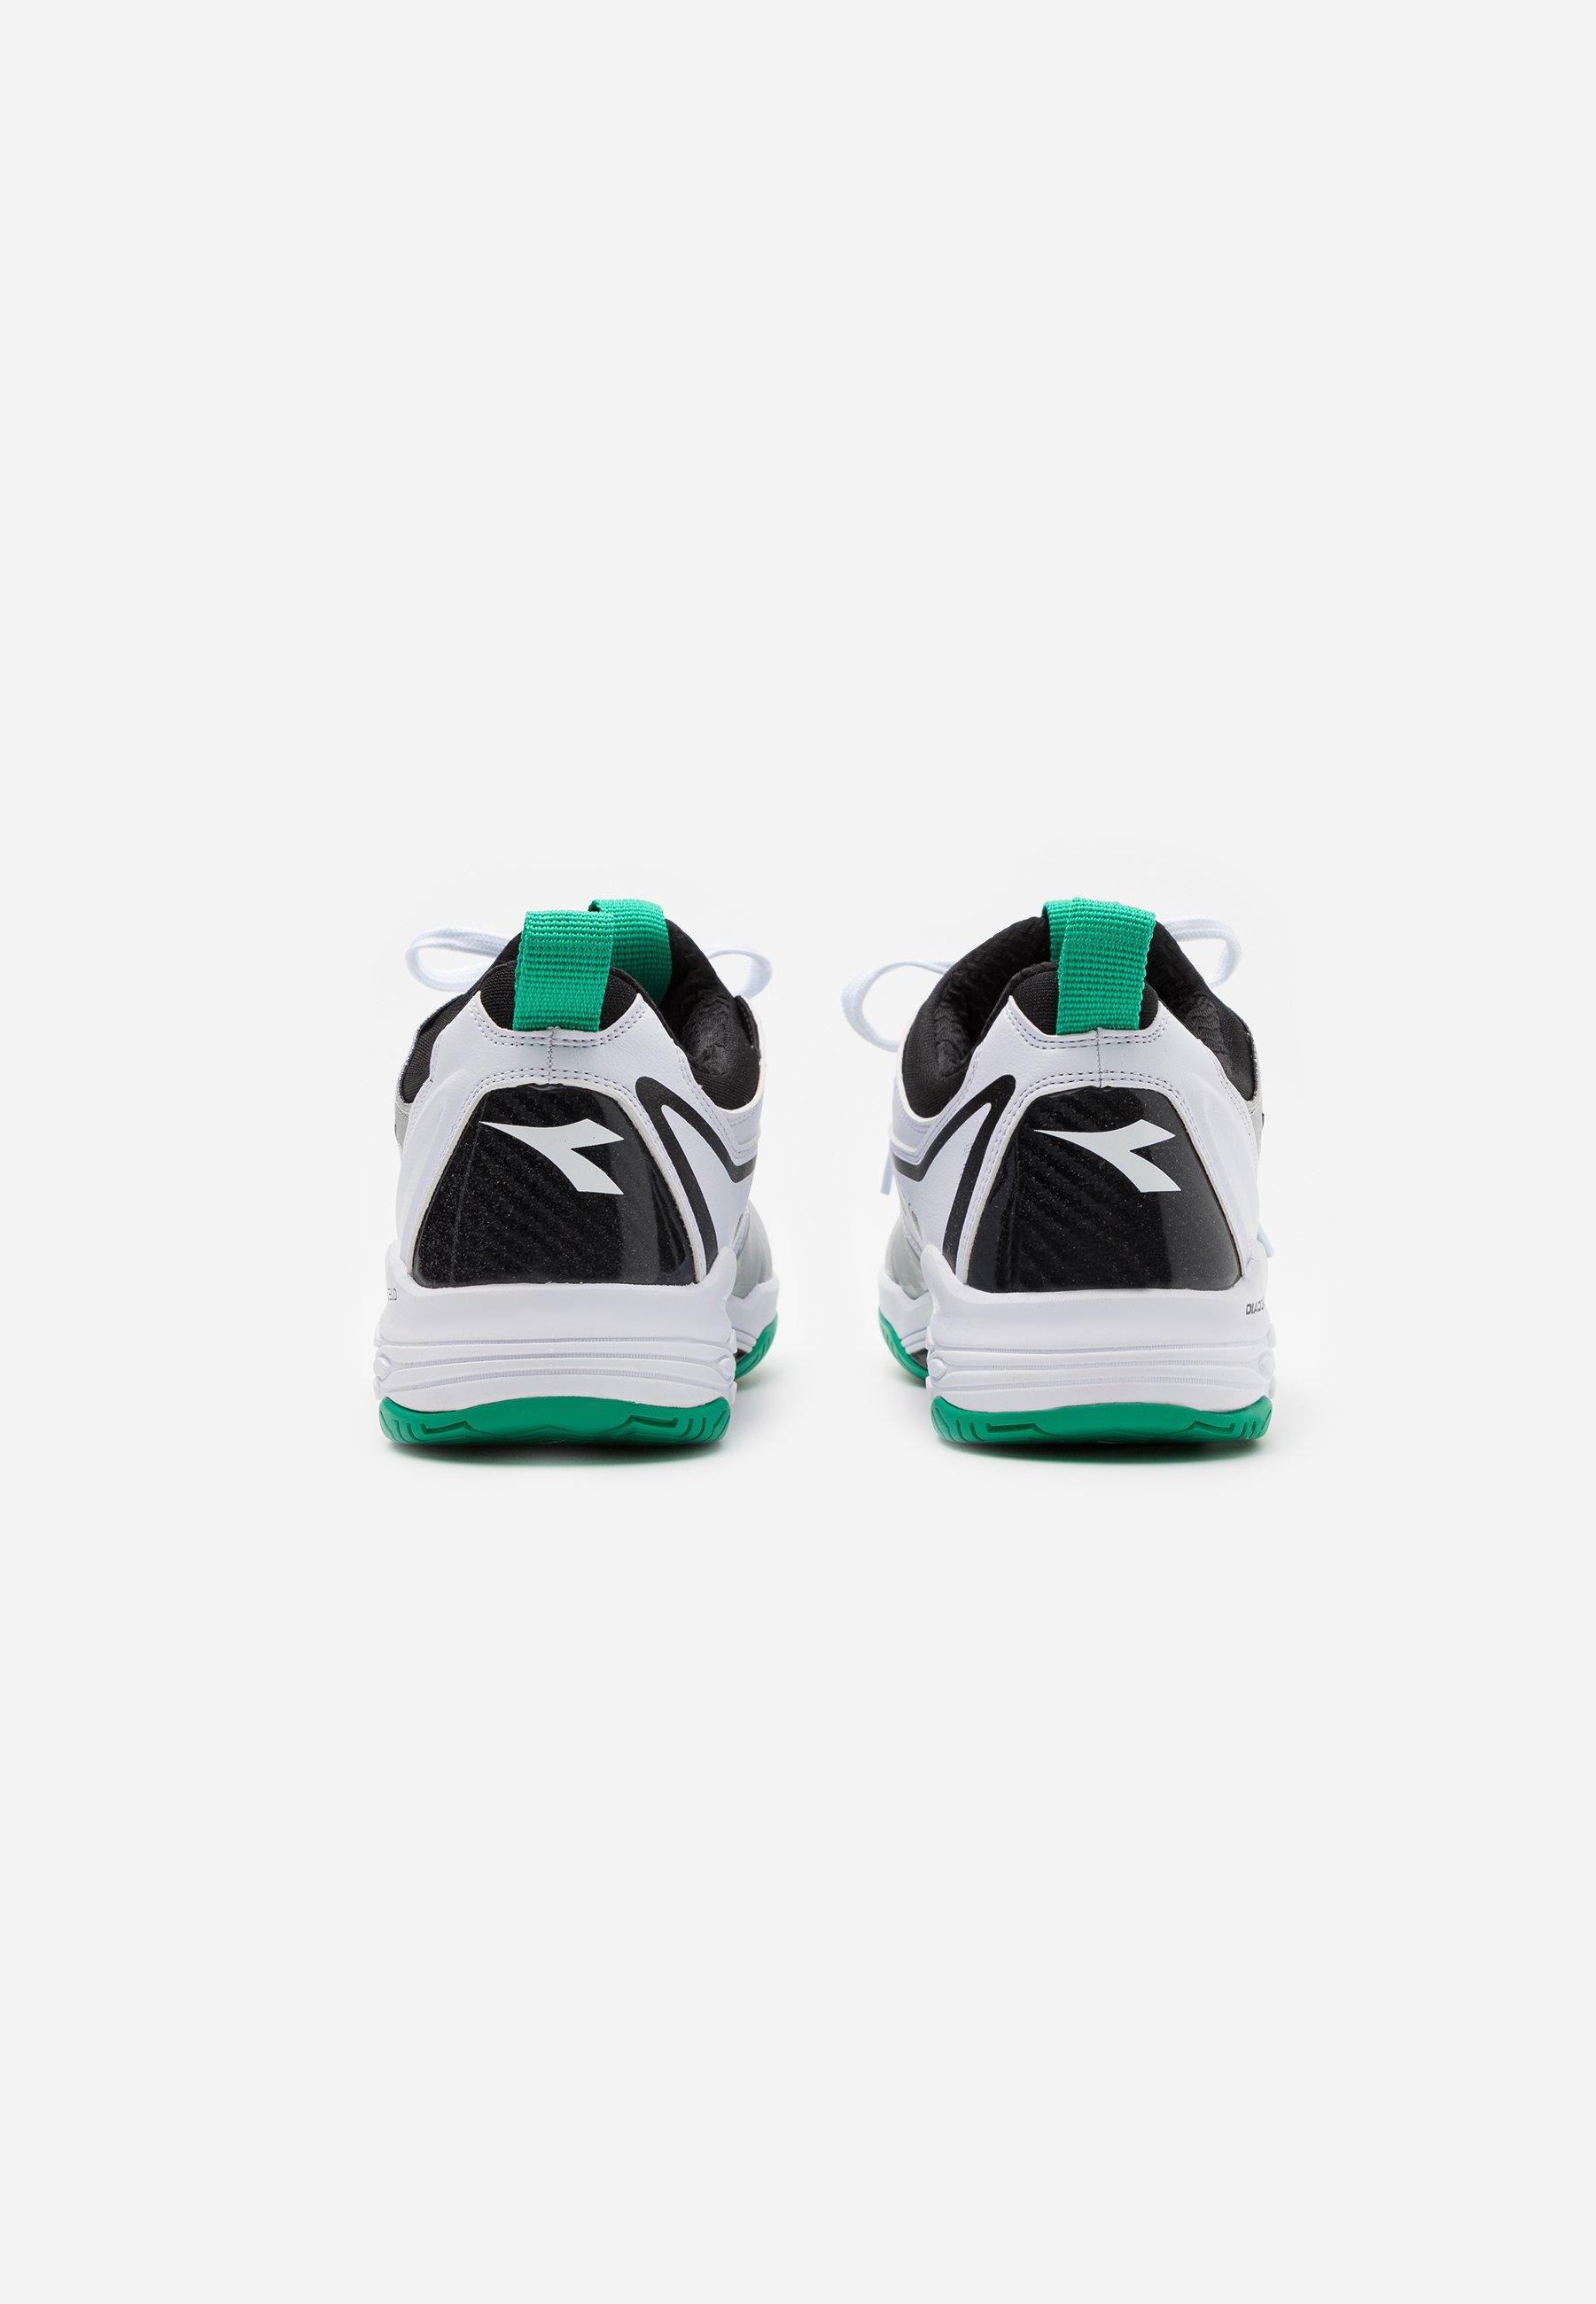 Ordine Scarpe da uomo Diadora SPEED BLUSHIELD FLY 2 + AG Scarpe da tennis per tutte le superfici white/holly green/black